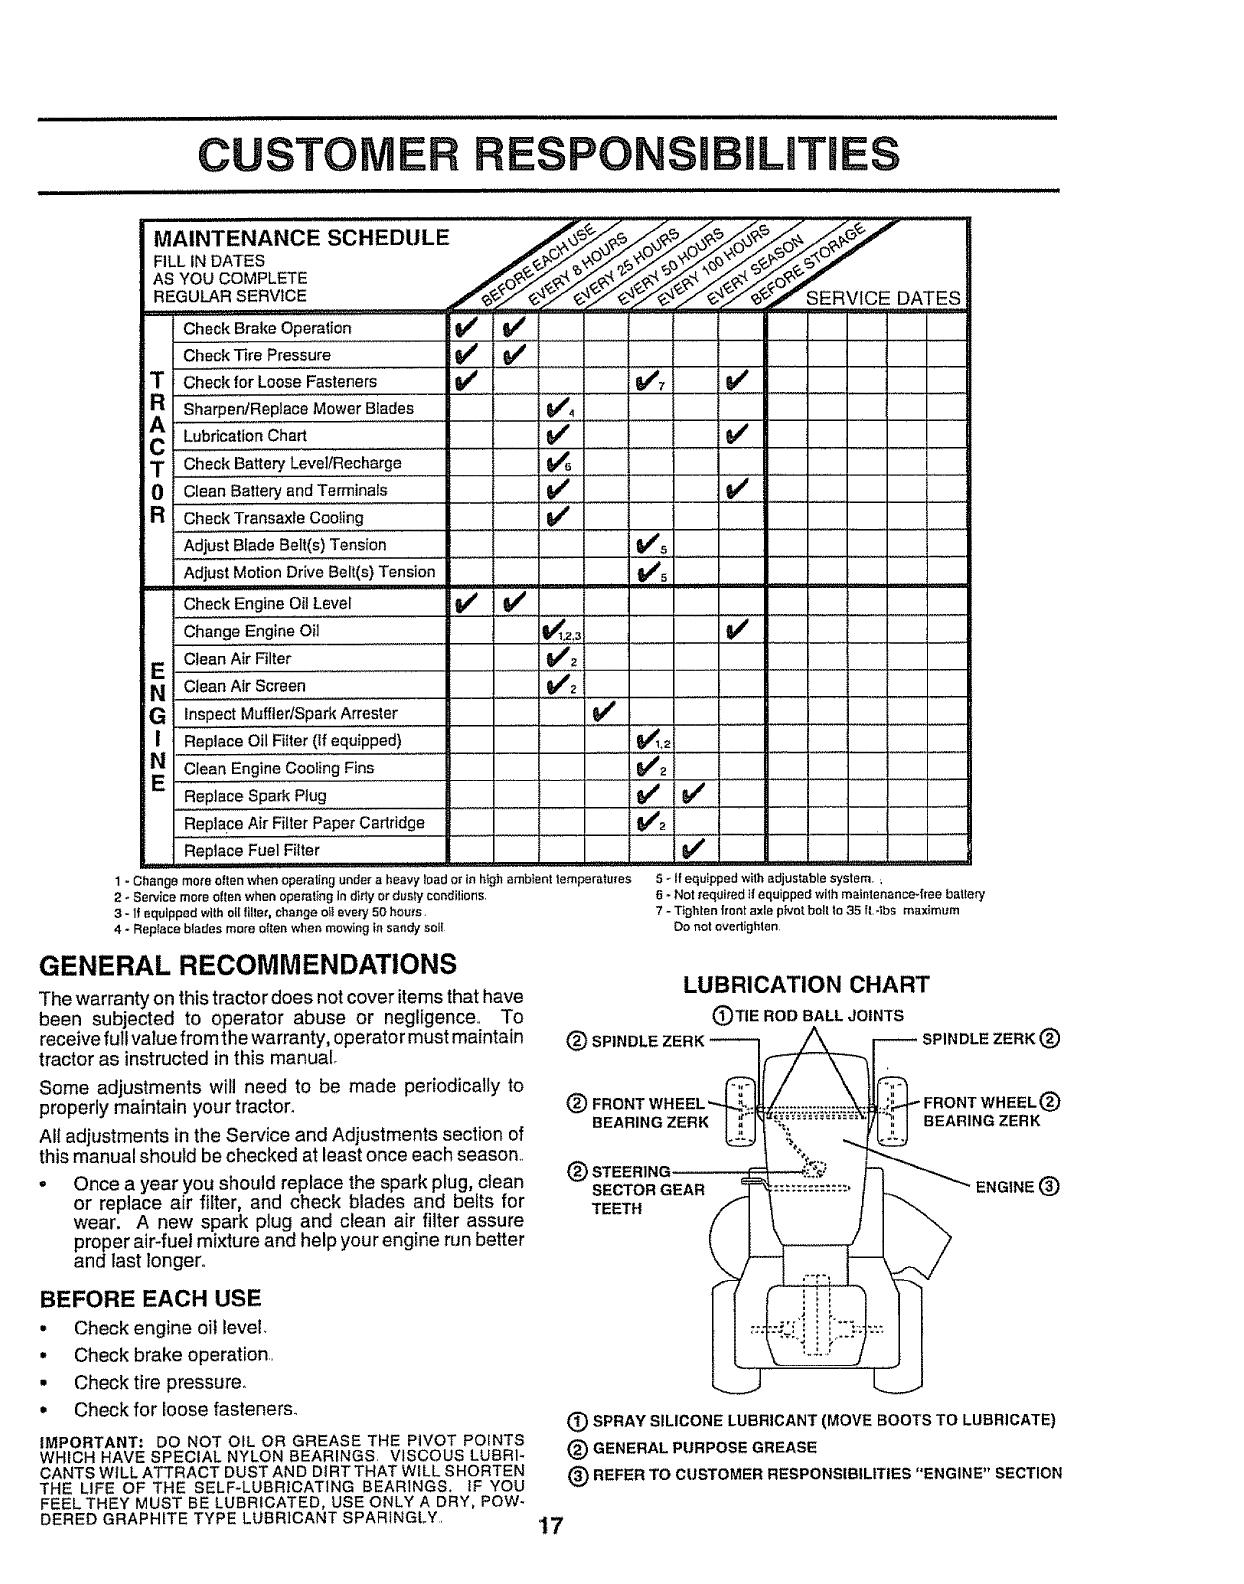 Wiring Diagram For 917 Asco Accessory 47 Printable Craftsman Model Mower Modern Diagrams Ideas Contactor Contemporary